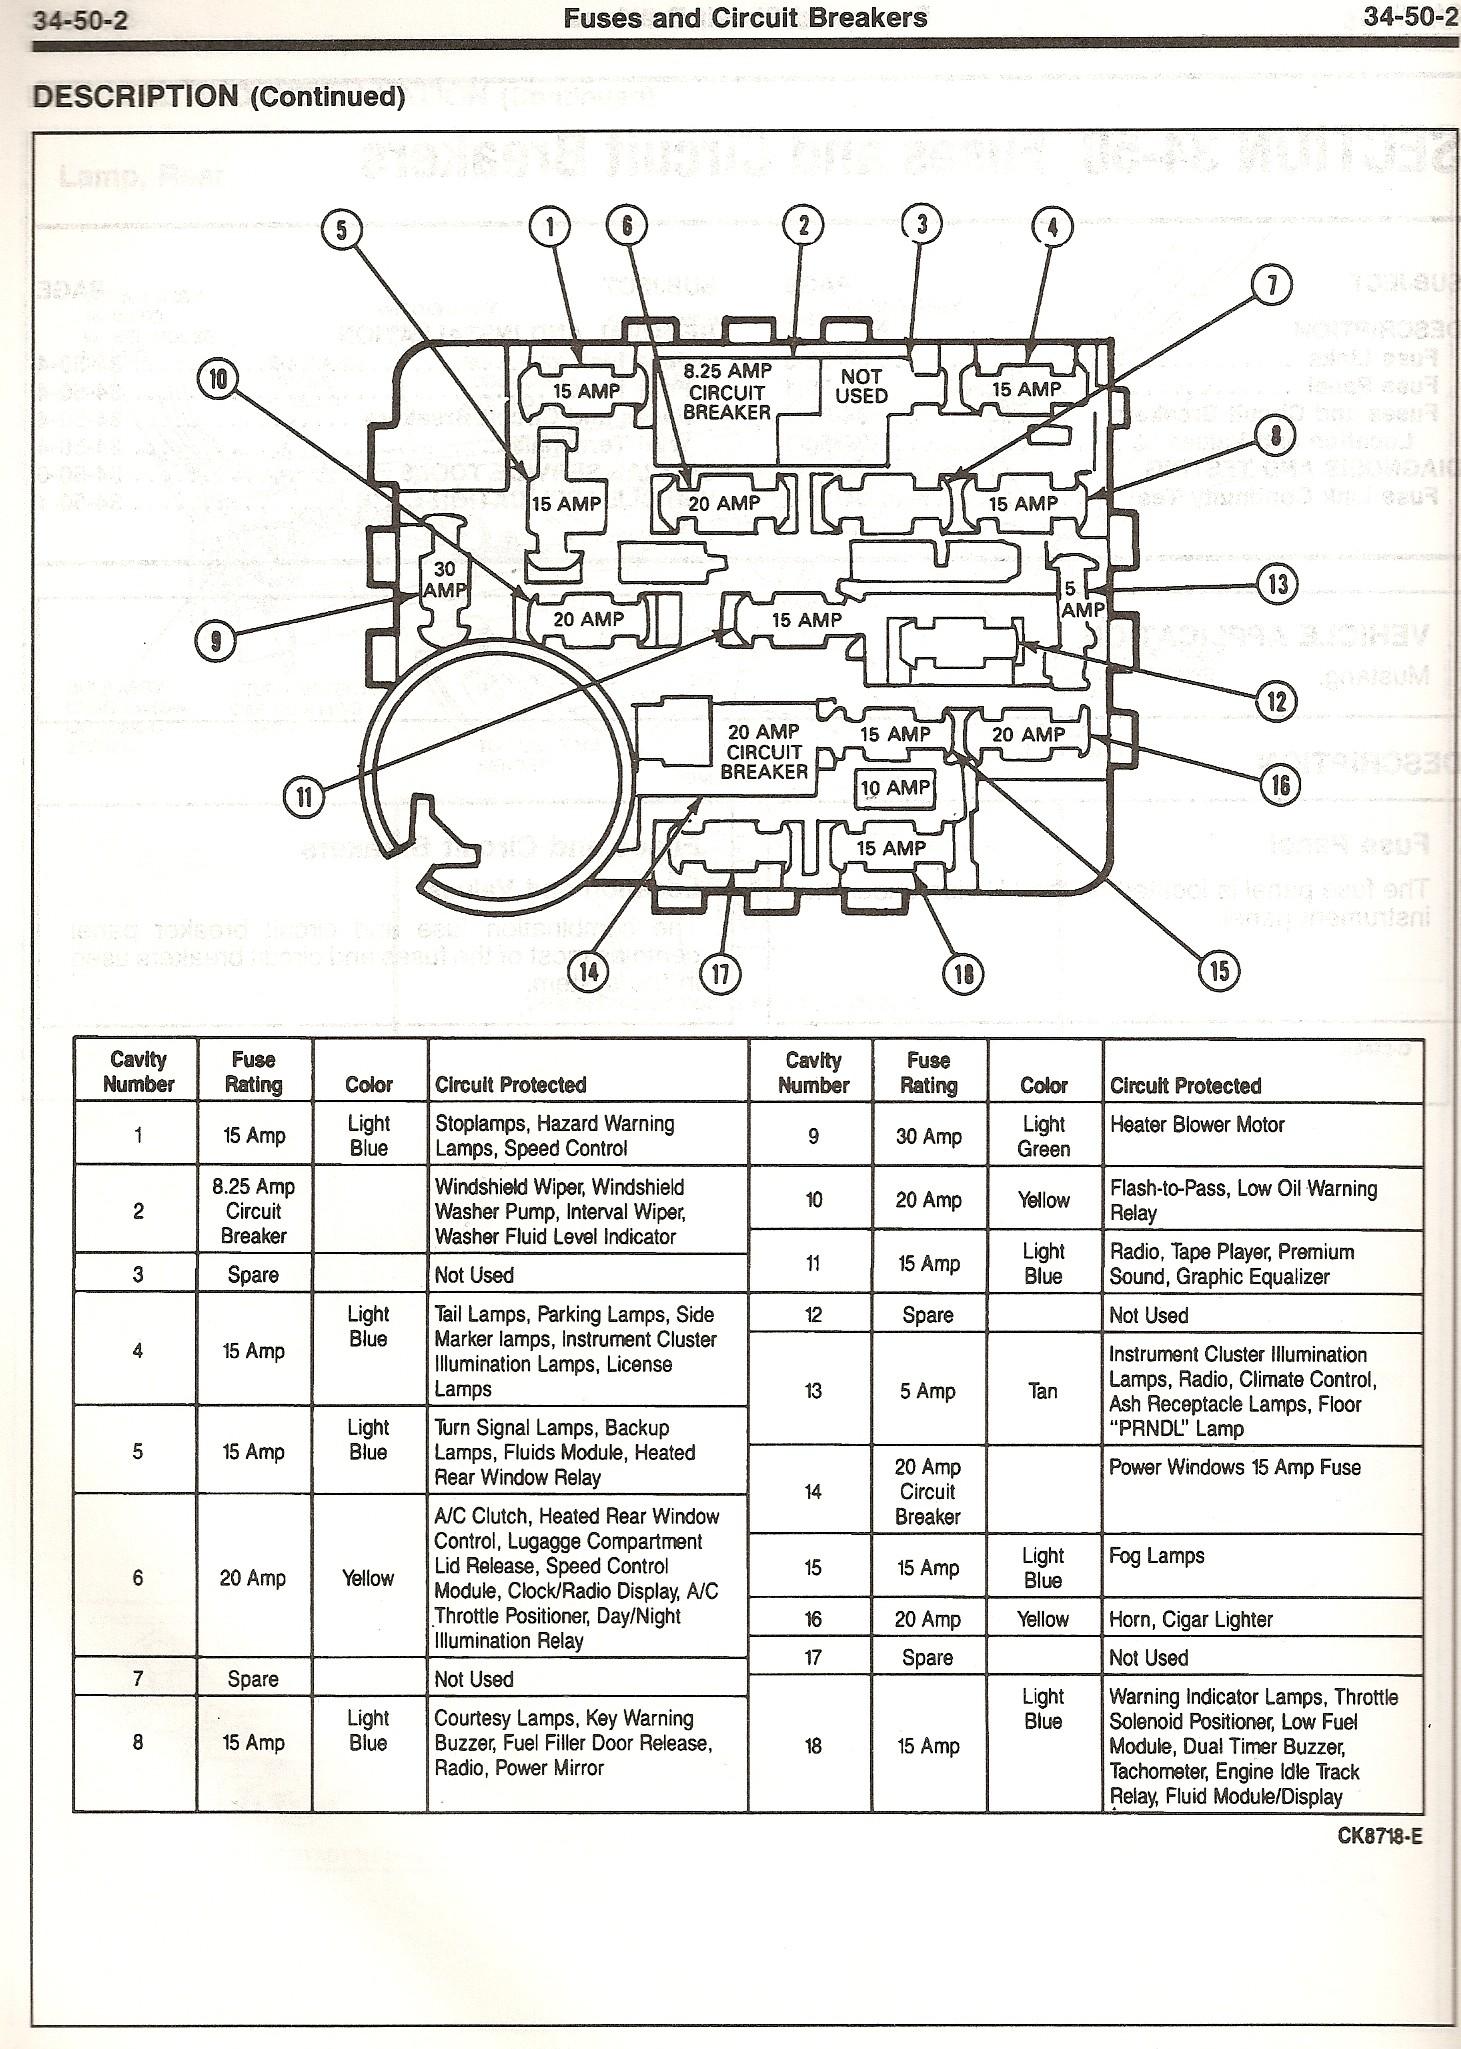 1986 ford f150 fuse box diagram 1986 ford f150 fuse box diagram rh parsplus co 2008 Ford Ranger Fuse Location 2008 Ford Ranger Fuse Location